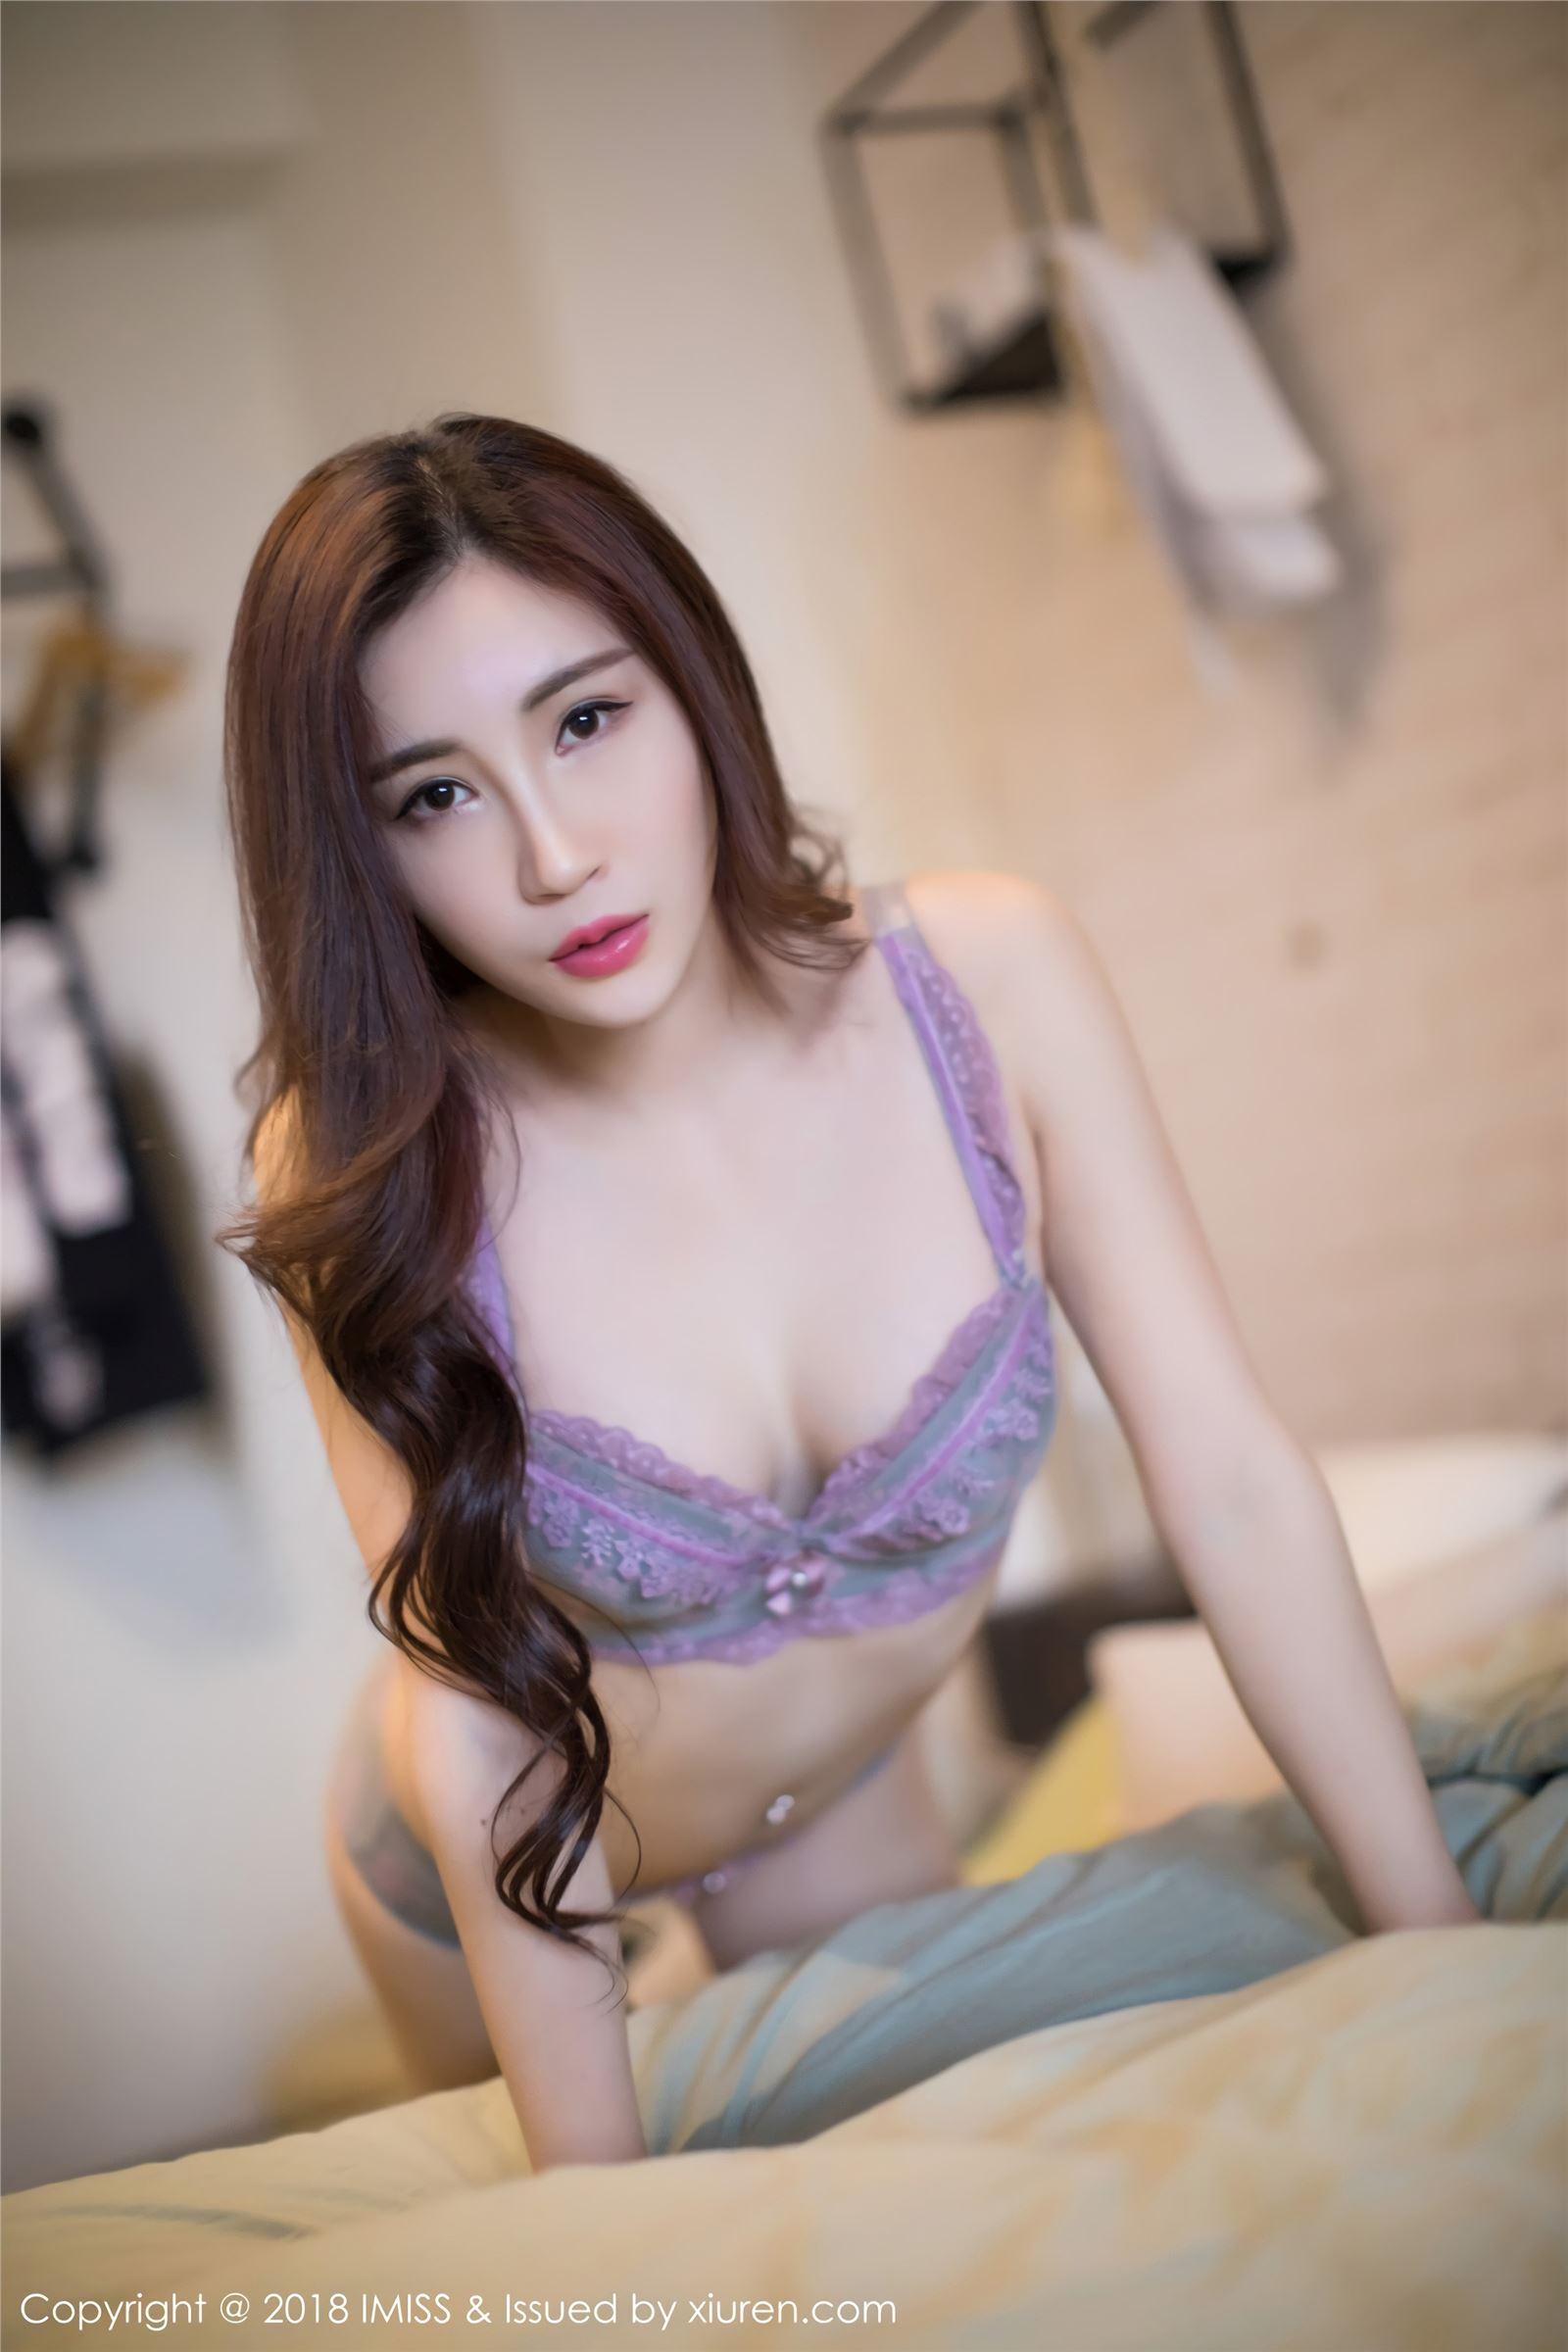 IMISS爱蜜社 写真 2018.02.08 VOL.216 美女主播 孙梦瑶V